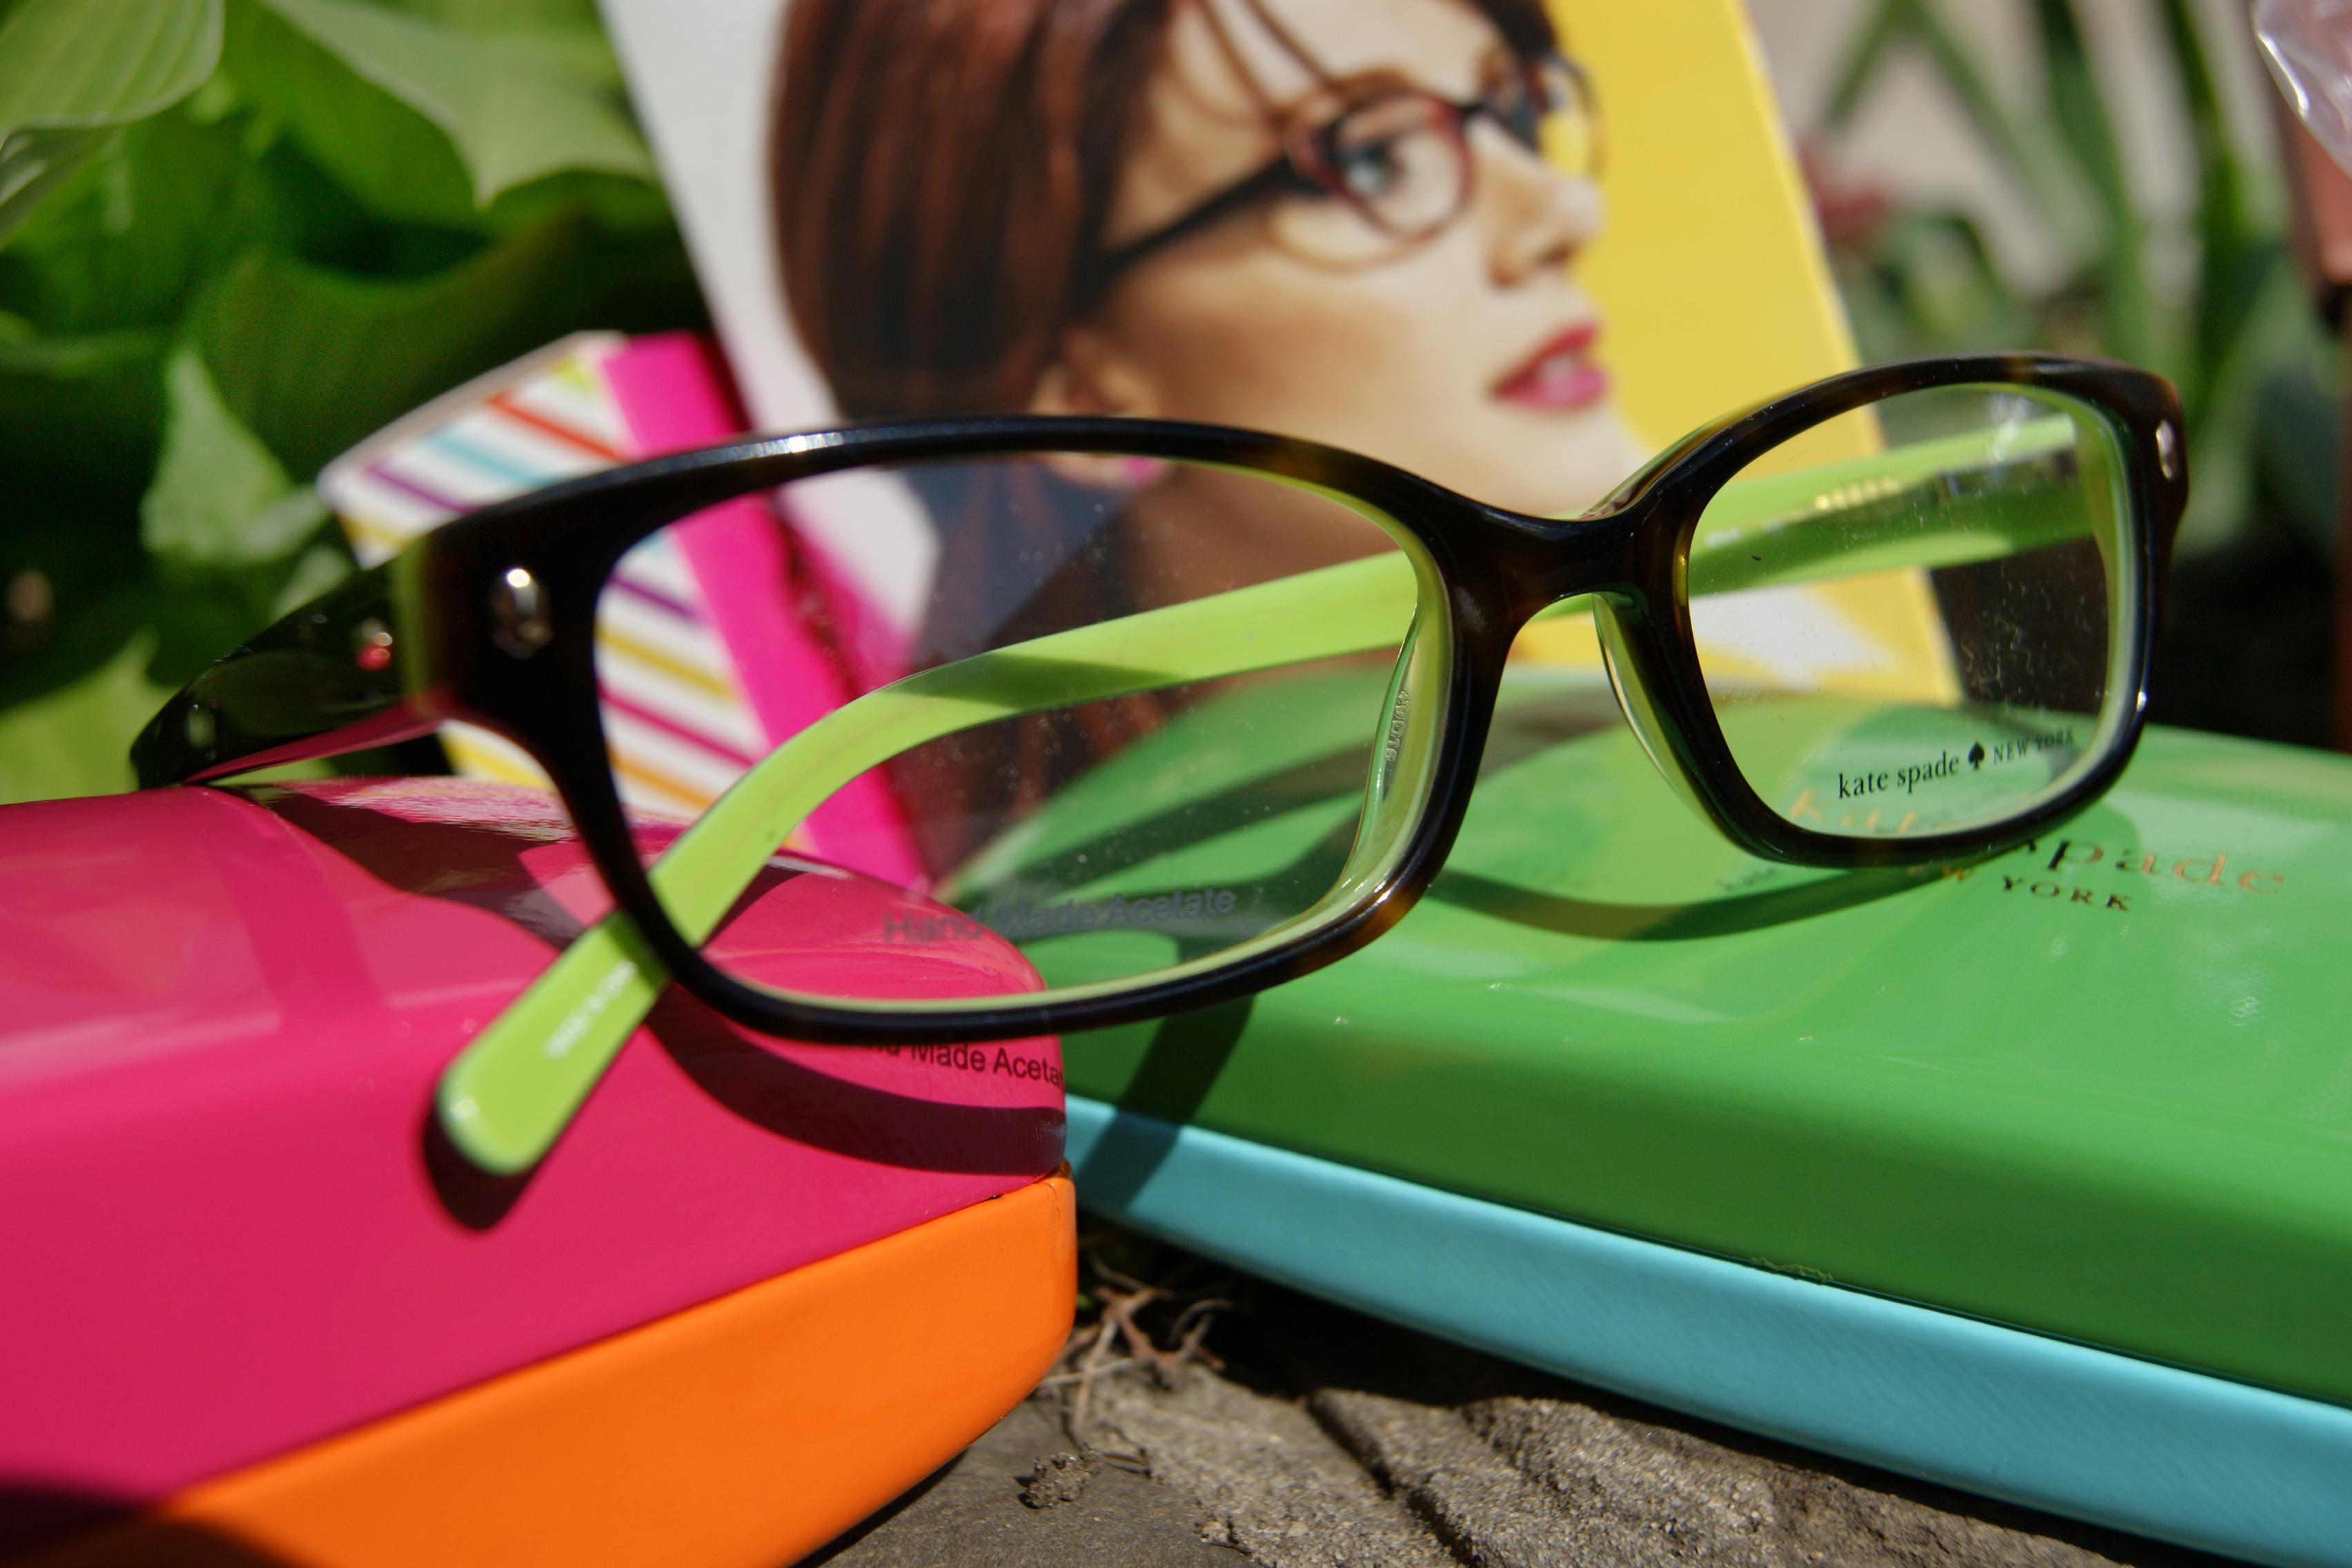 Eyeglasses dallas - All